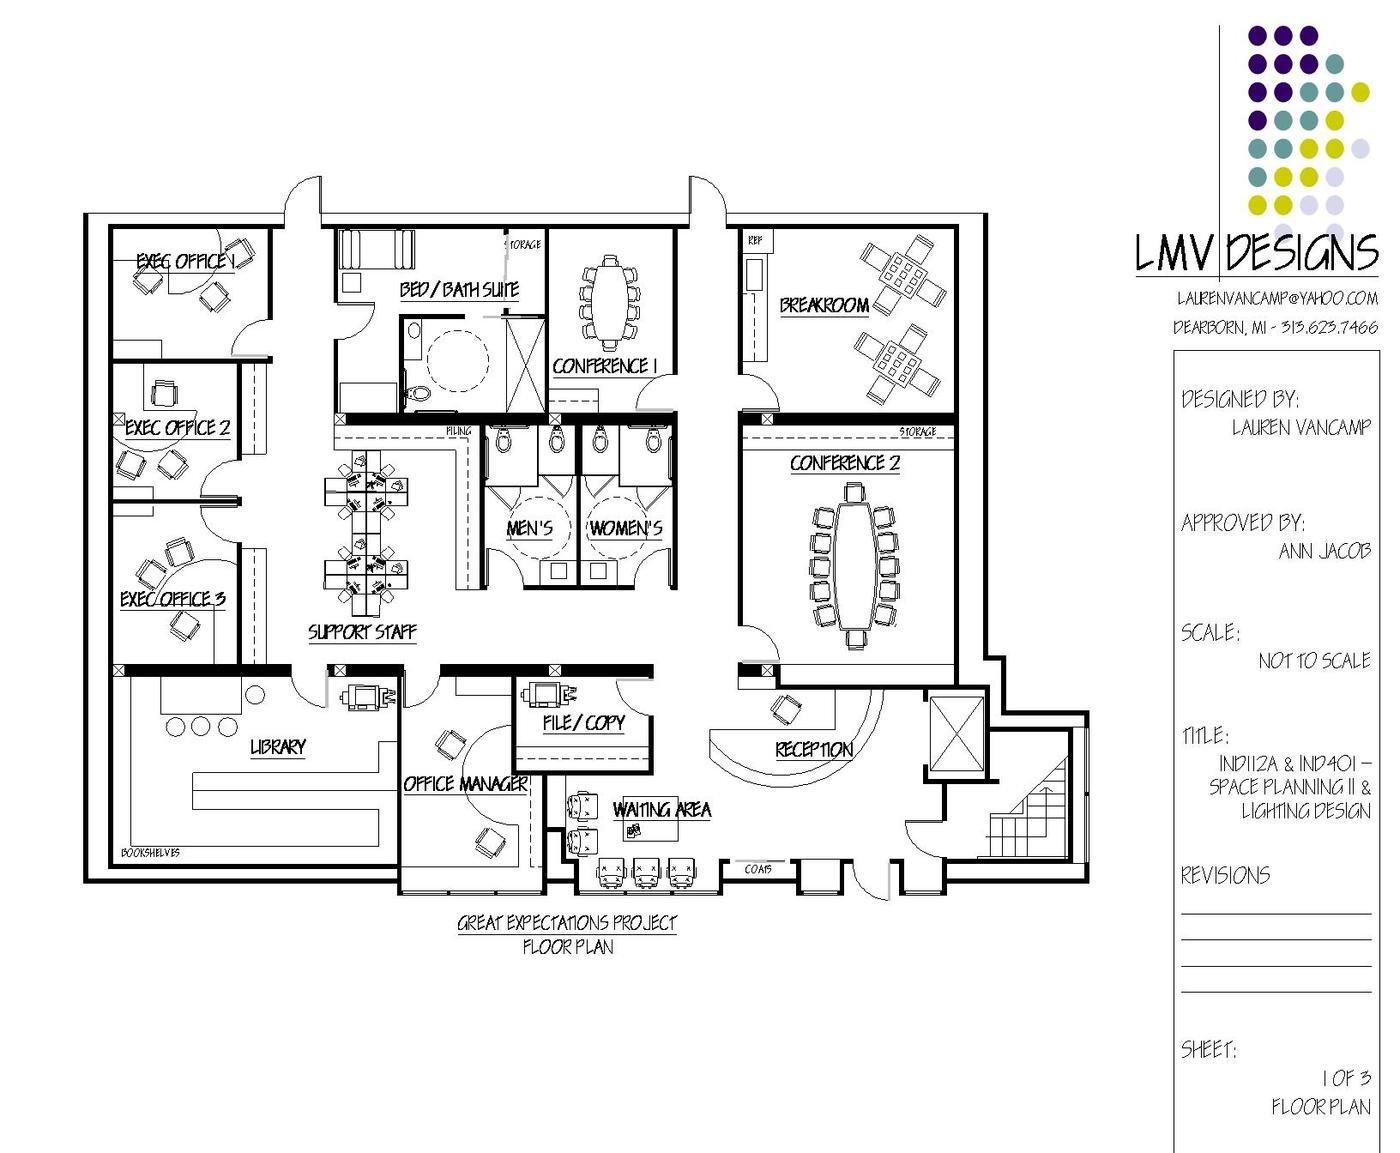 An Energetic Office Space by Lauren VanCamp at Coroflot.com